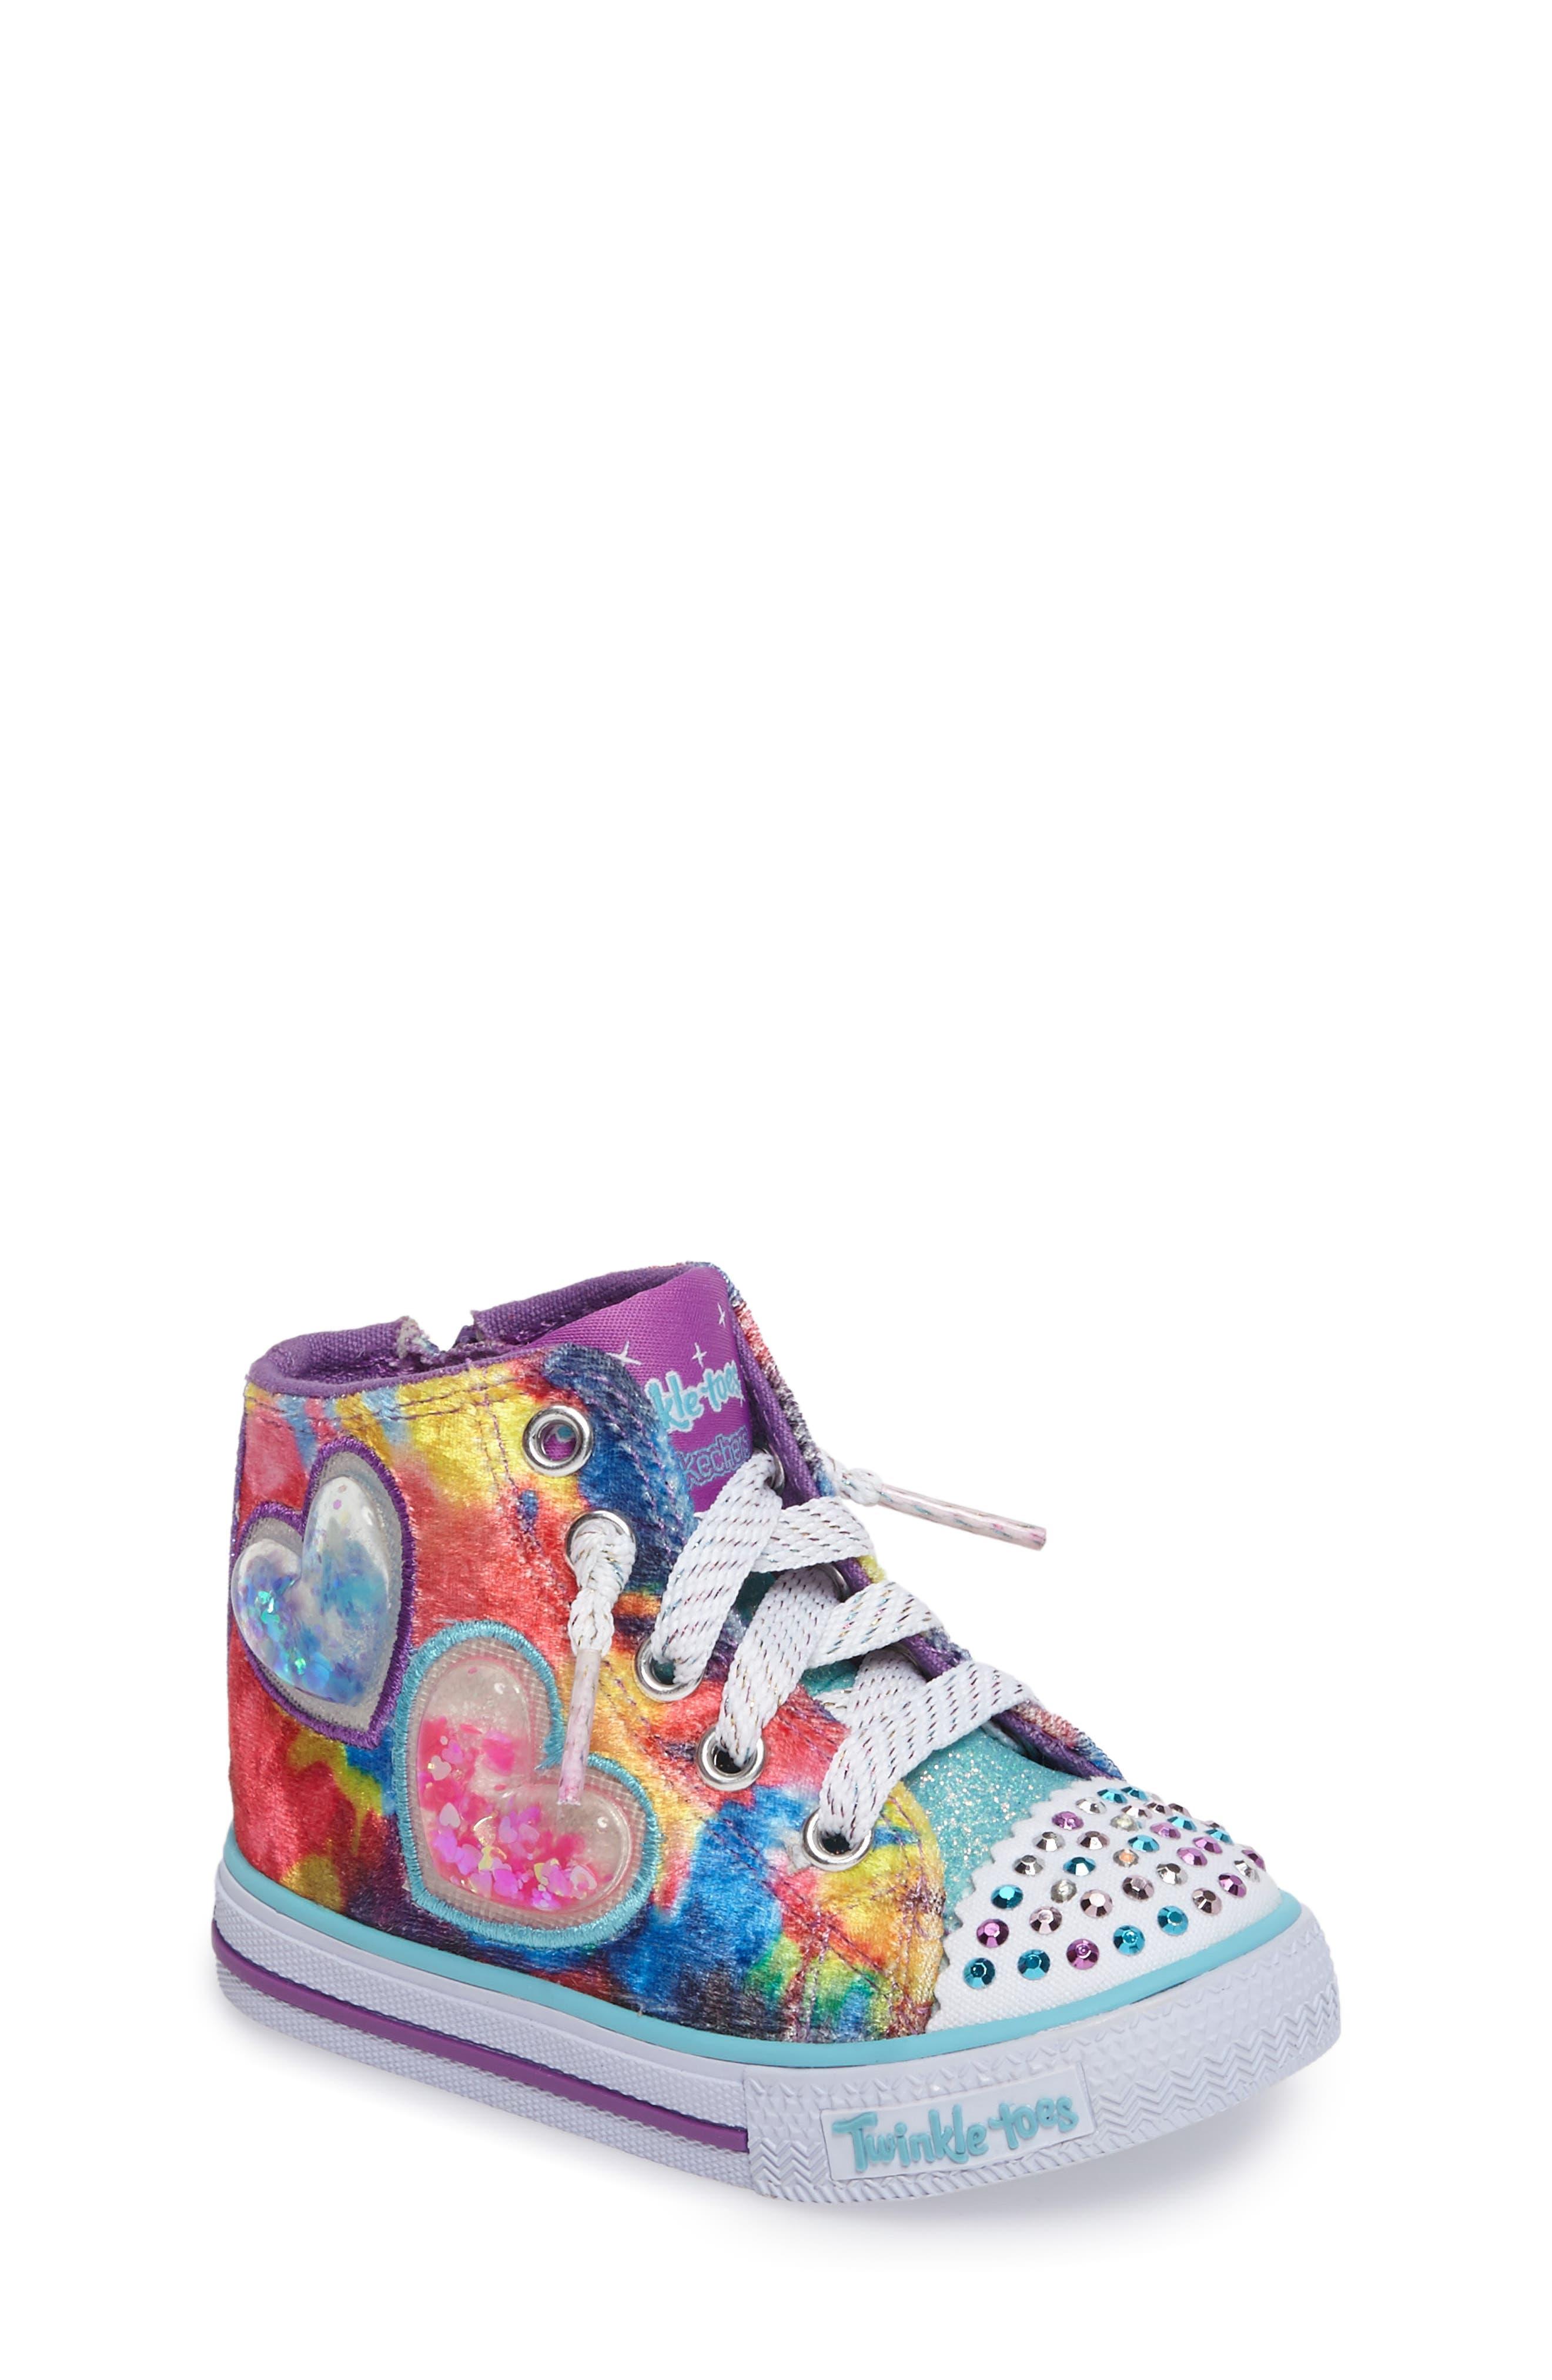 Baby Walker & Toddler SKECHERS Shoes